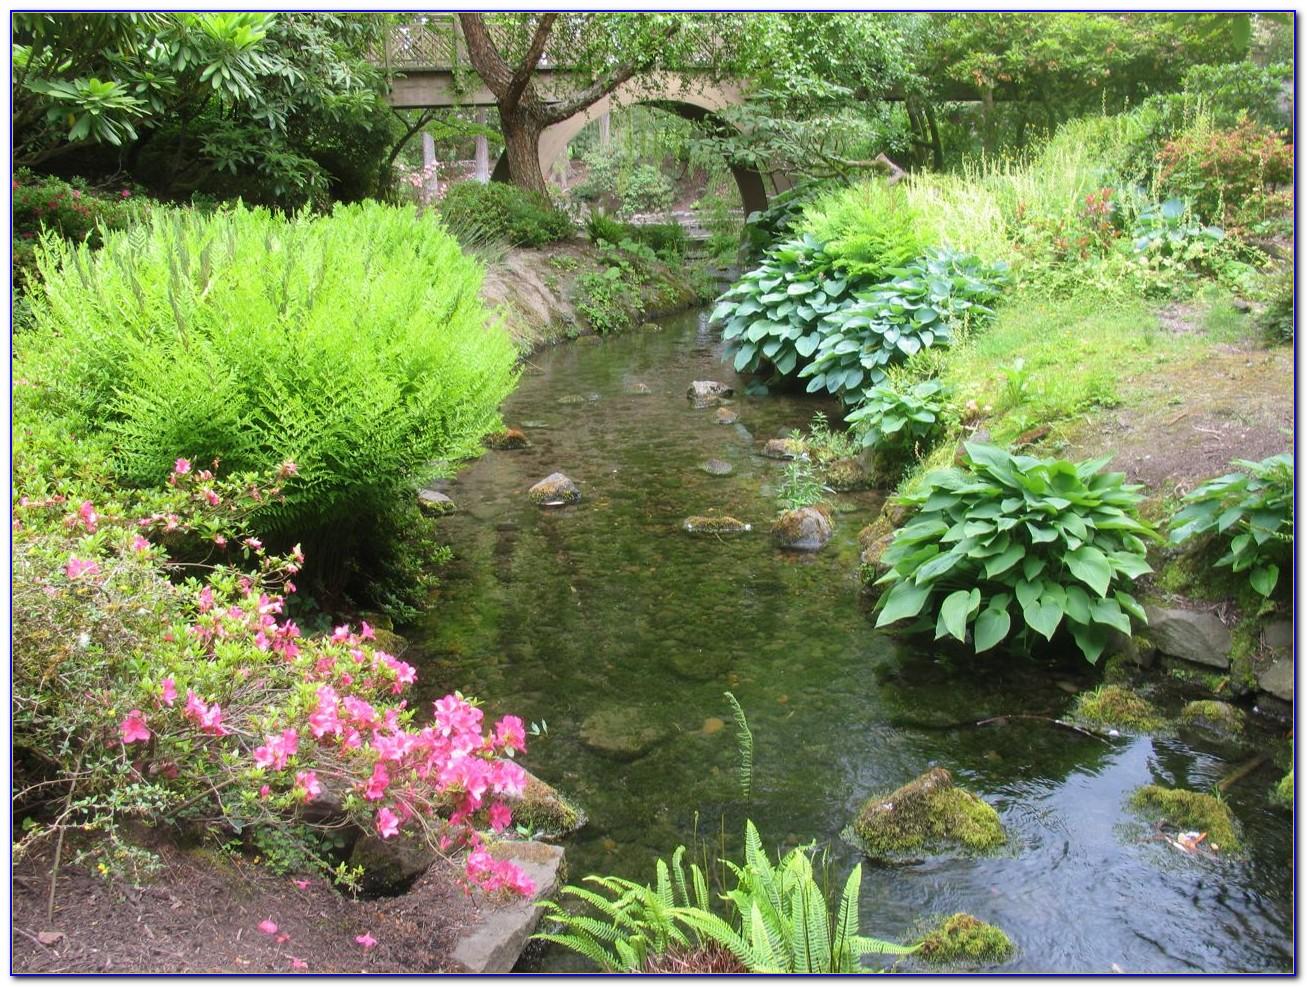 Crystal springs rhododendron garden admission garden home design ideas llq052zpkd50237 for Crystal springs rhododendron garden